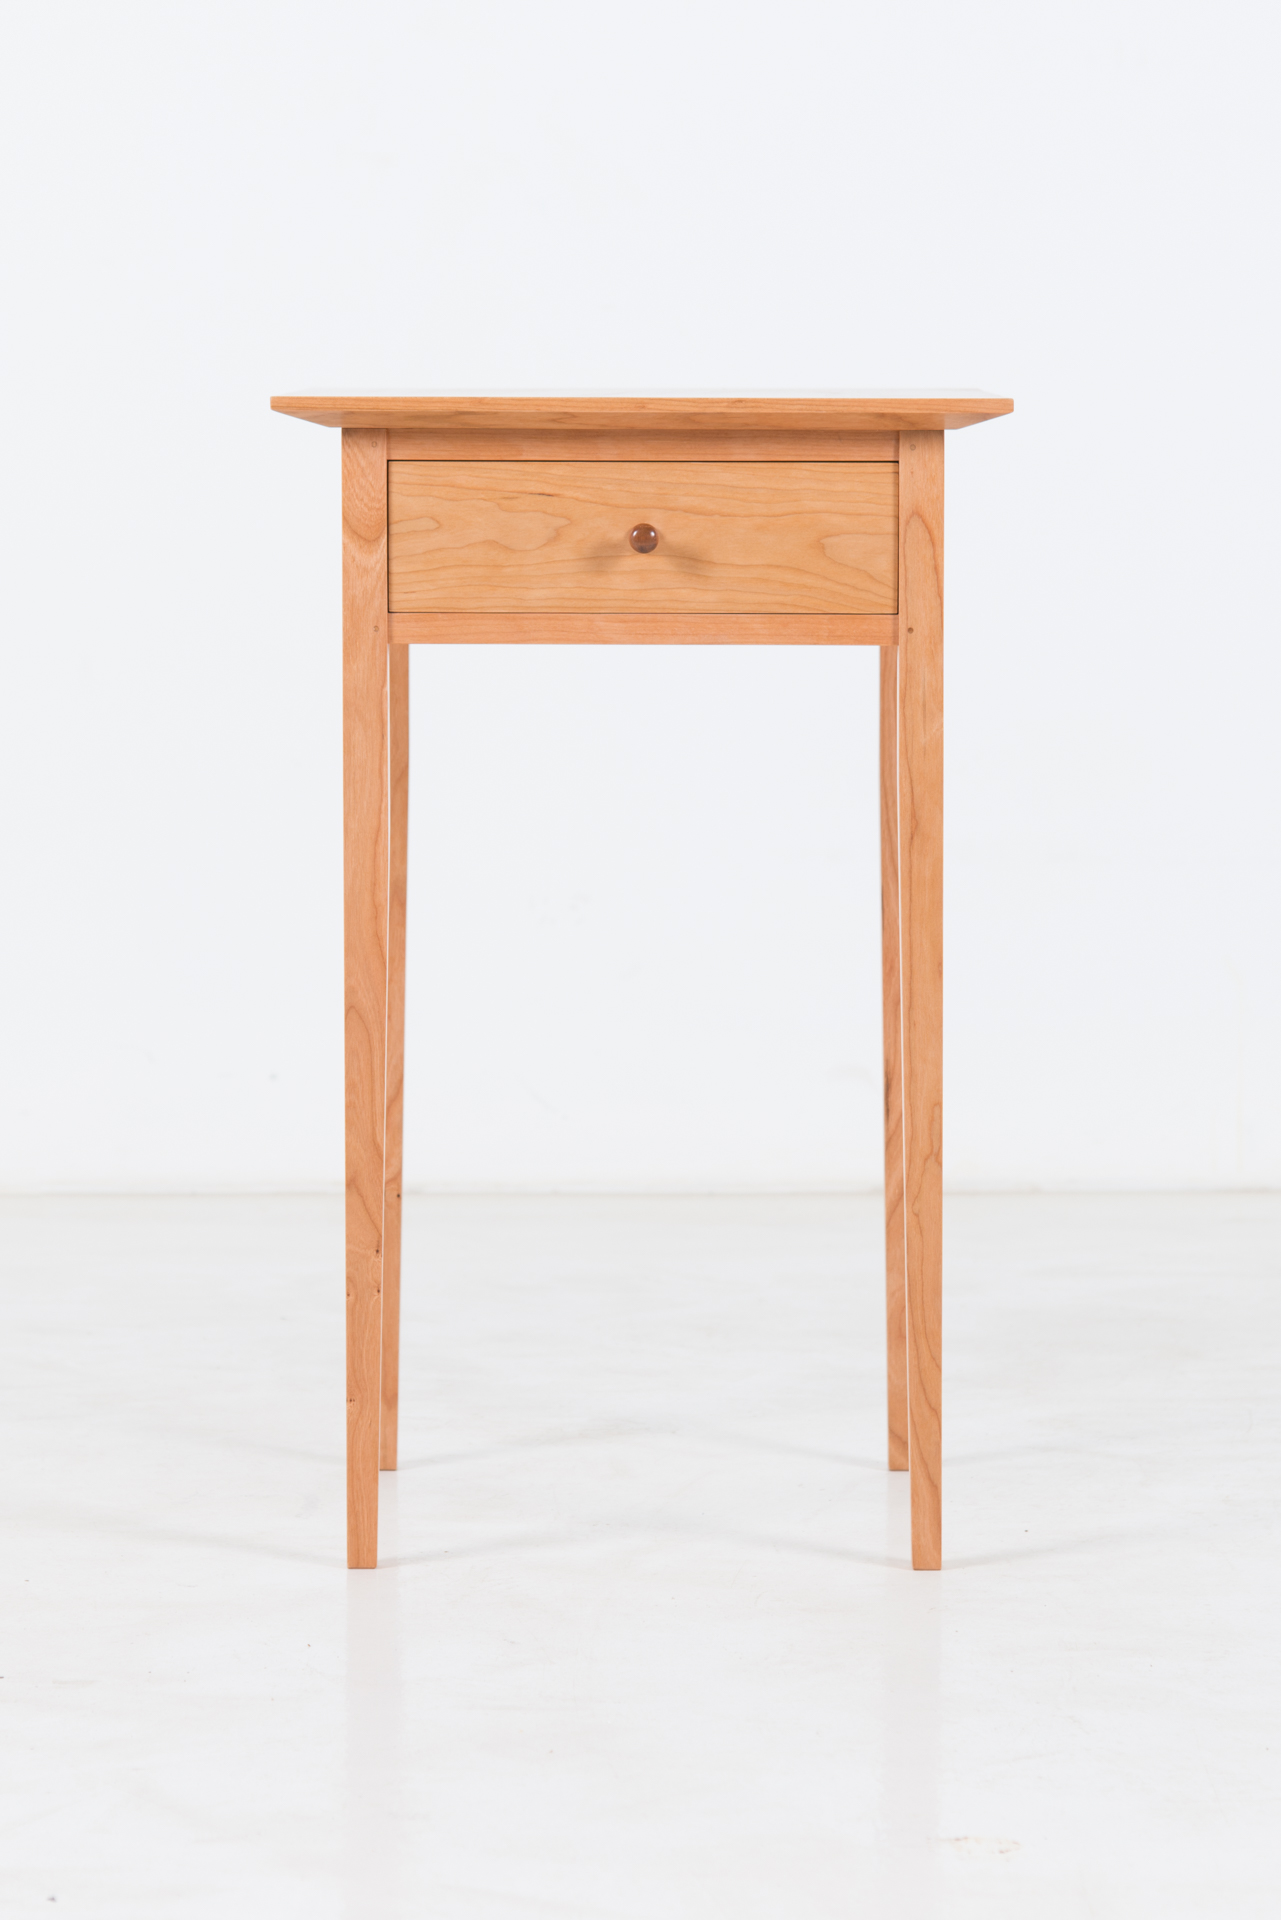 Shaker Square Table